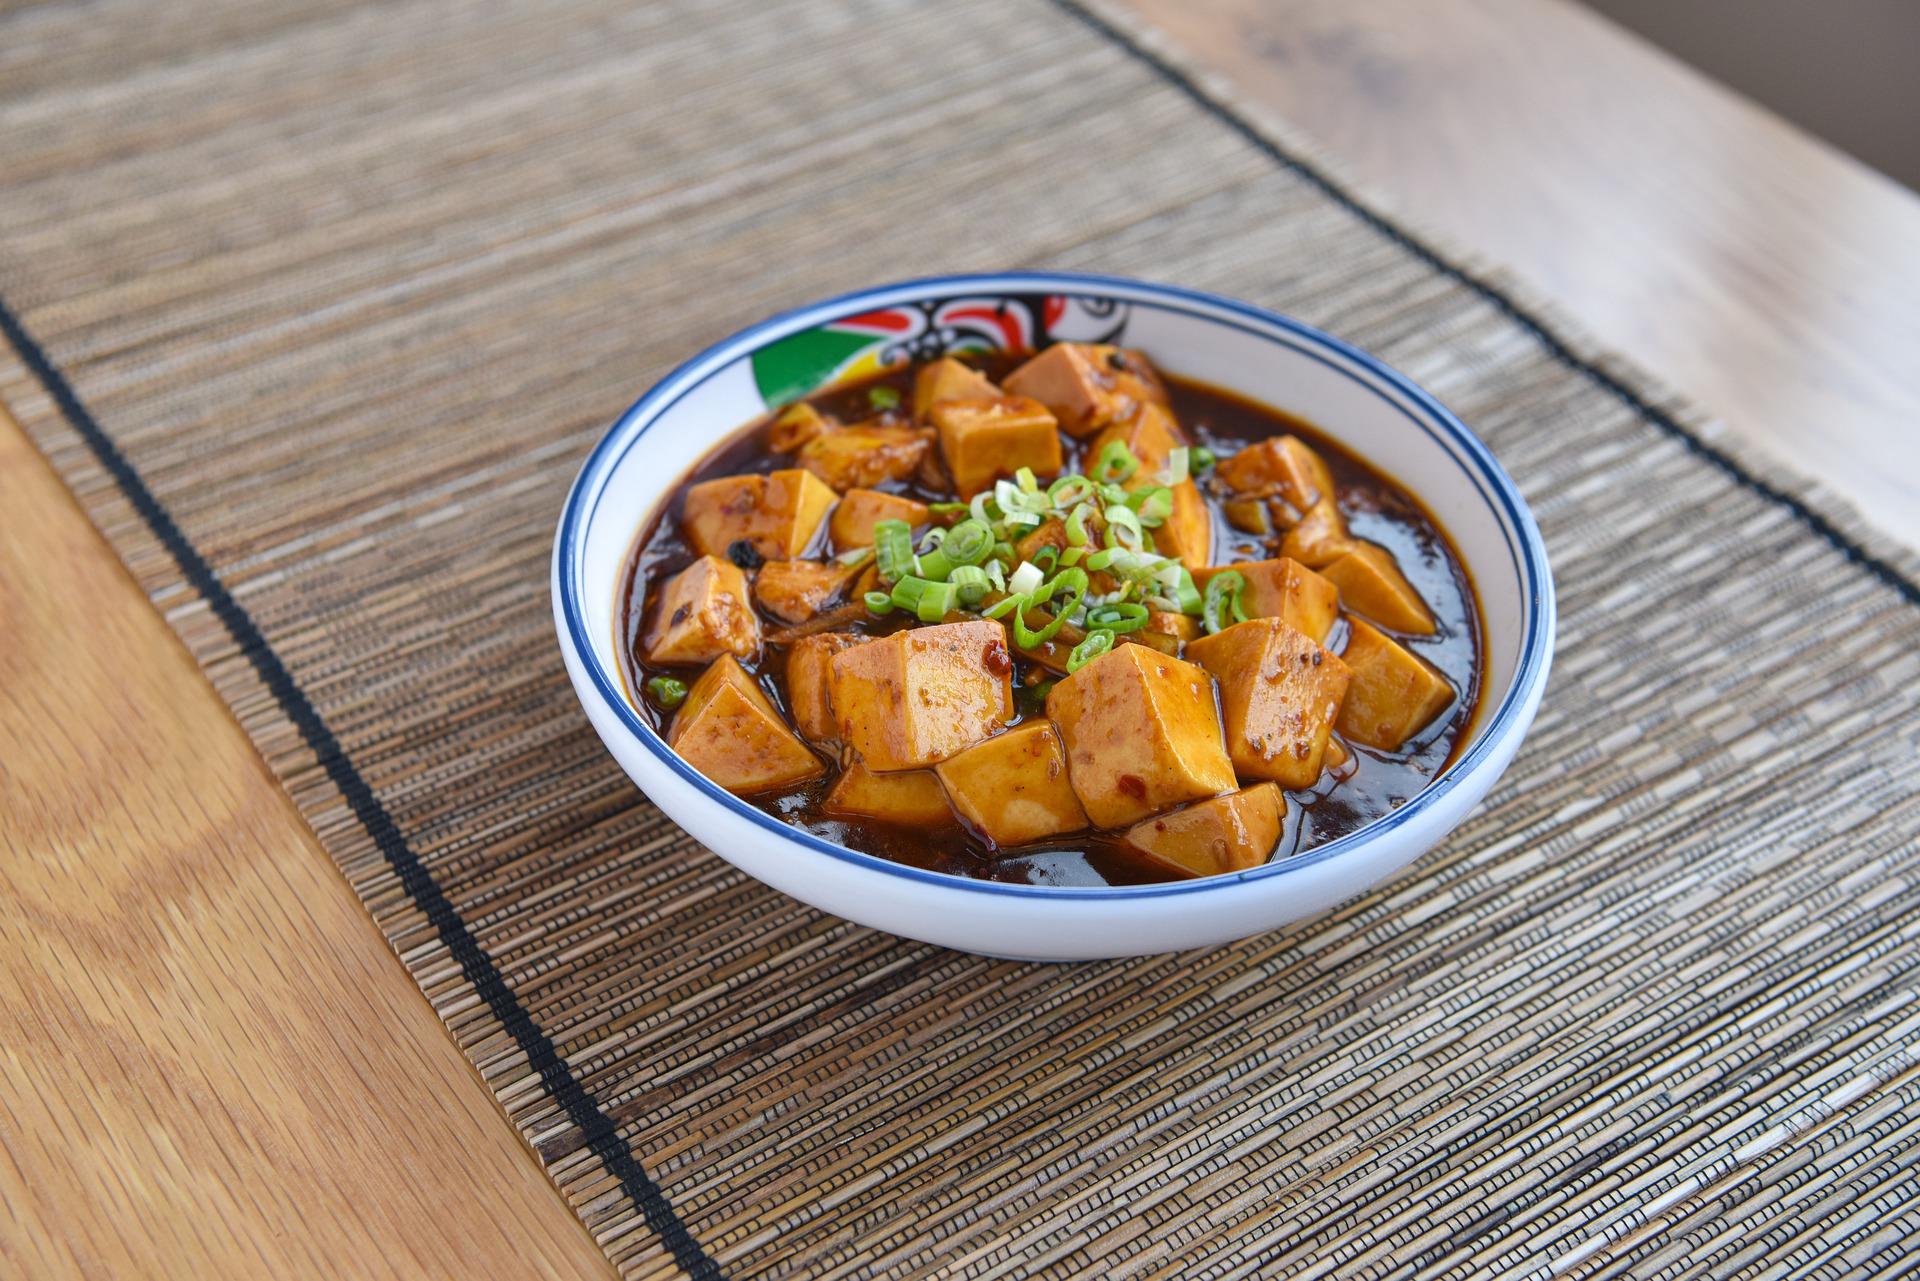 mapo-tofu-4985990_1920.jpg